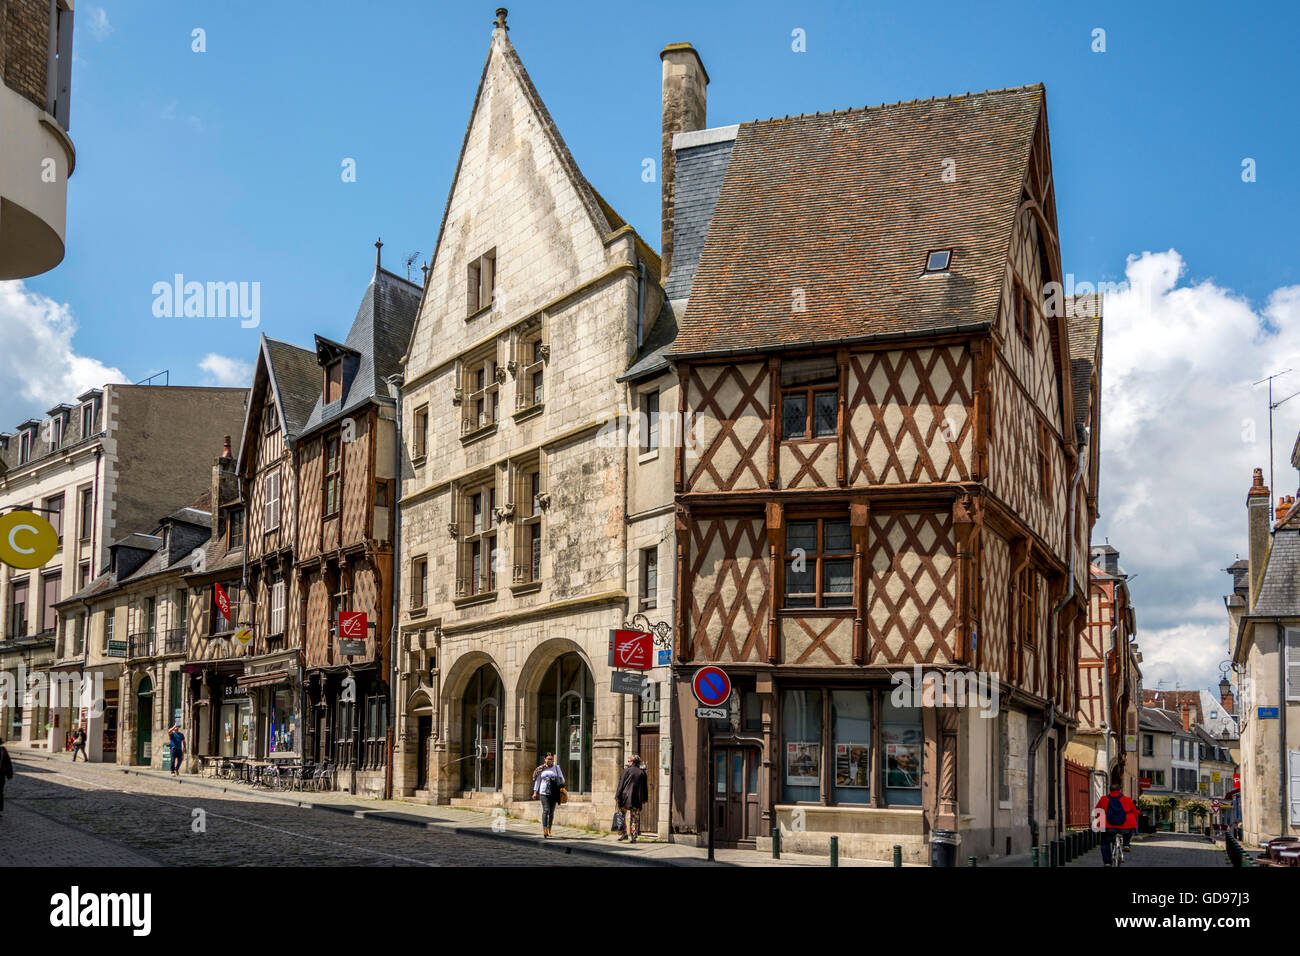 Bourges, typicals half-timberd houses, Cher department, region Centre-Val de Loire, France - Stock Image